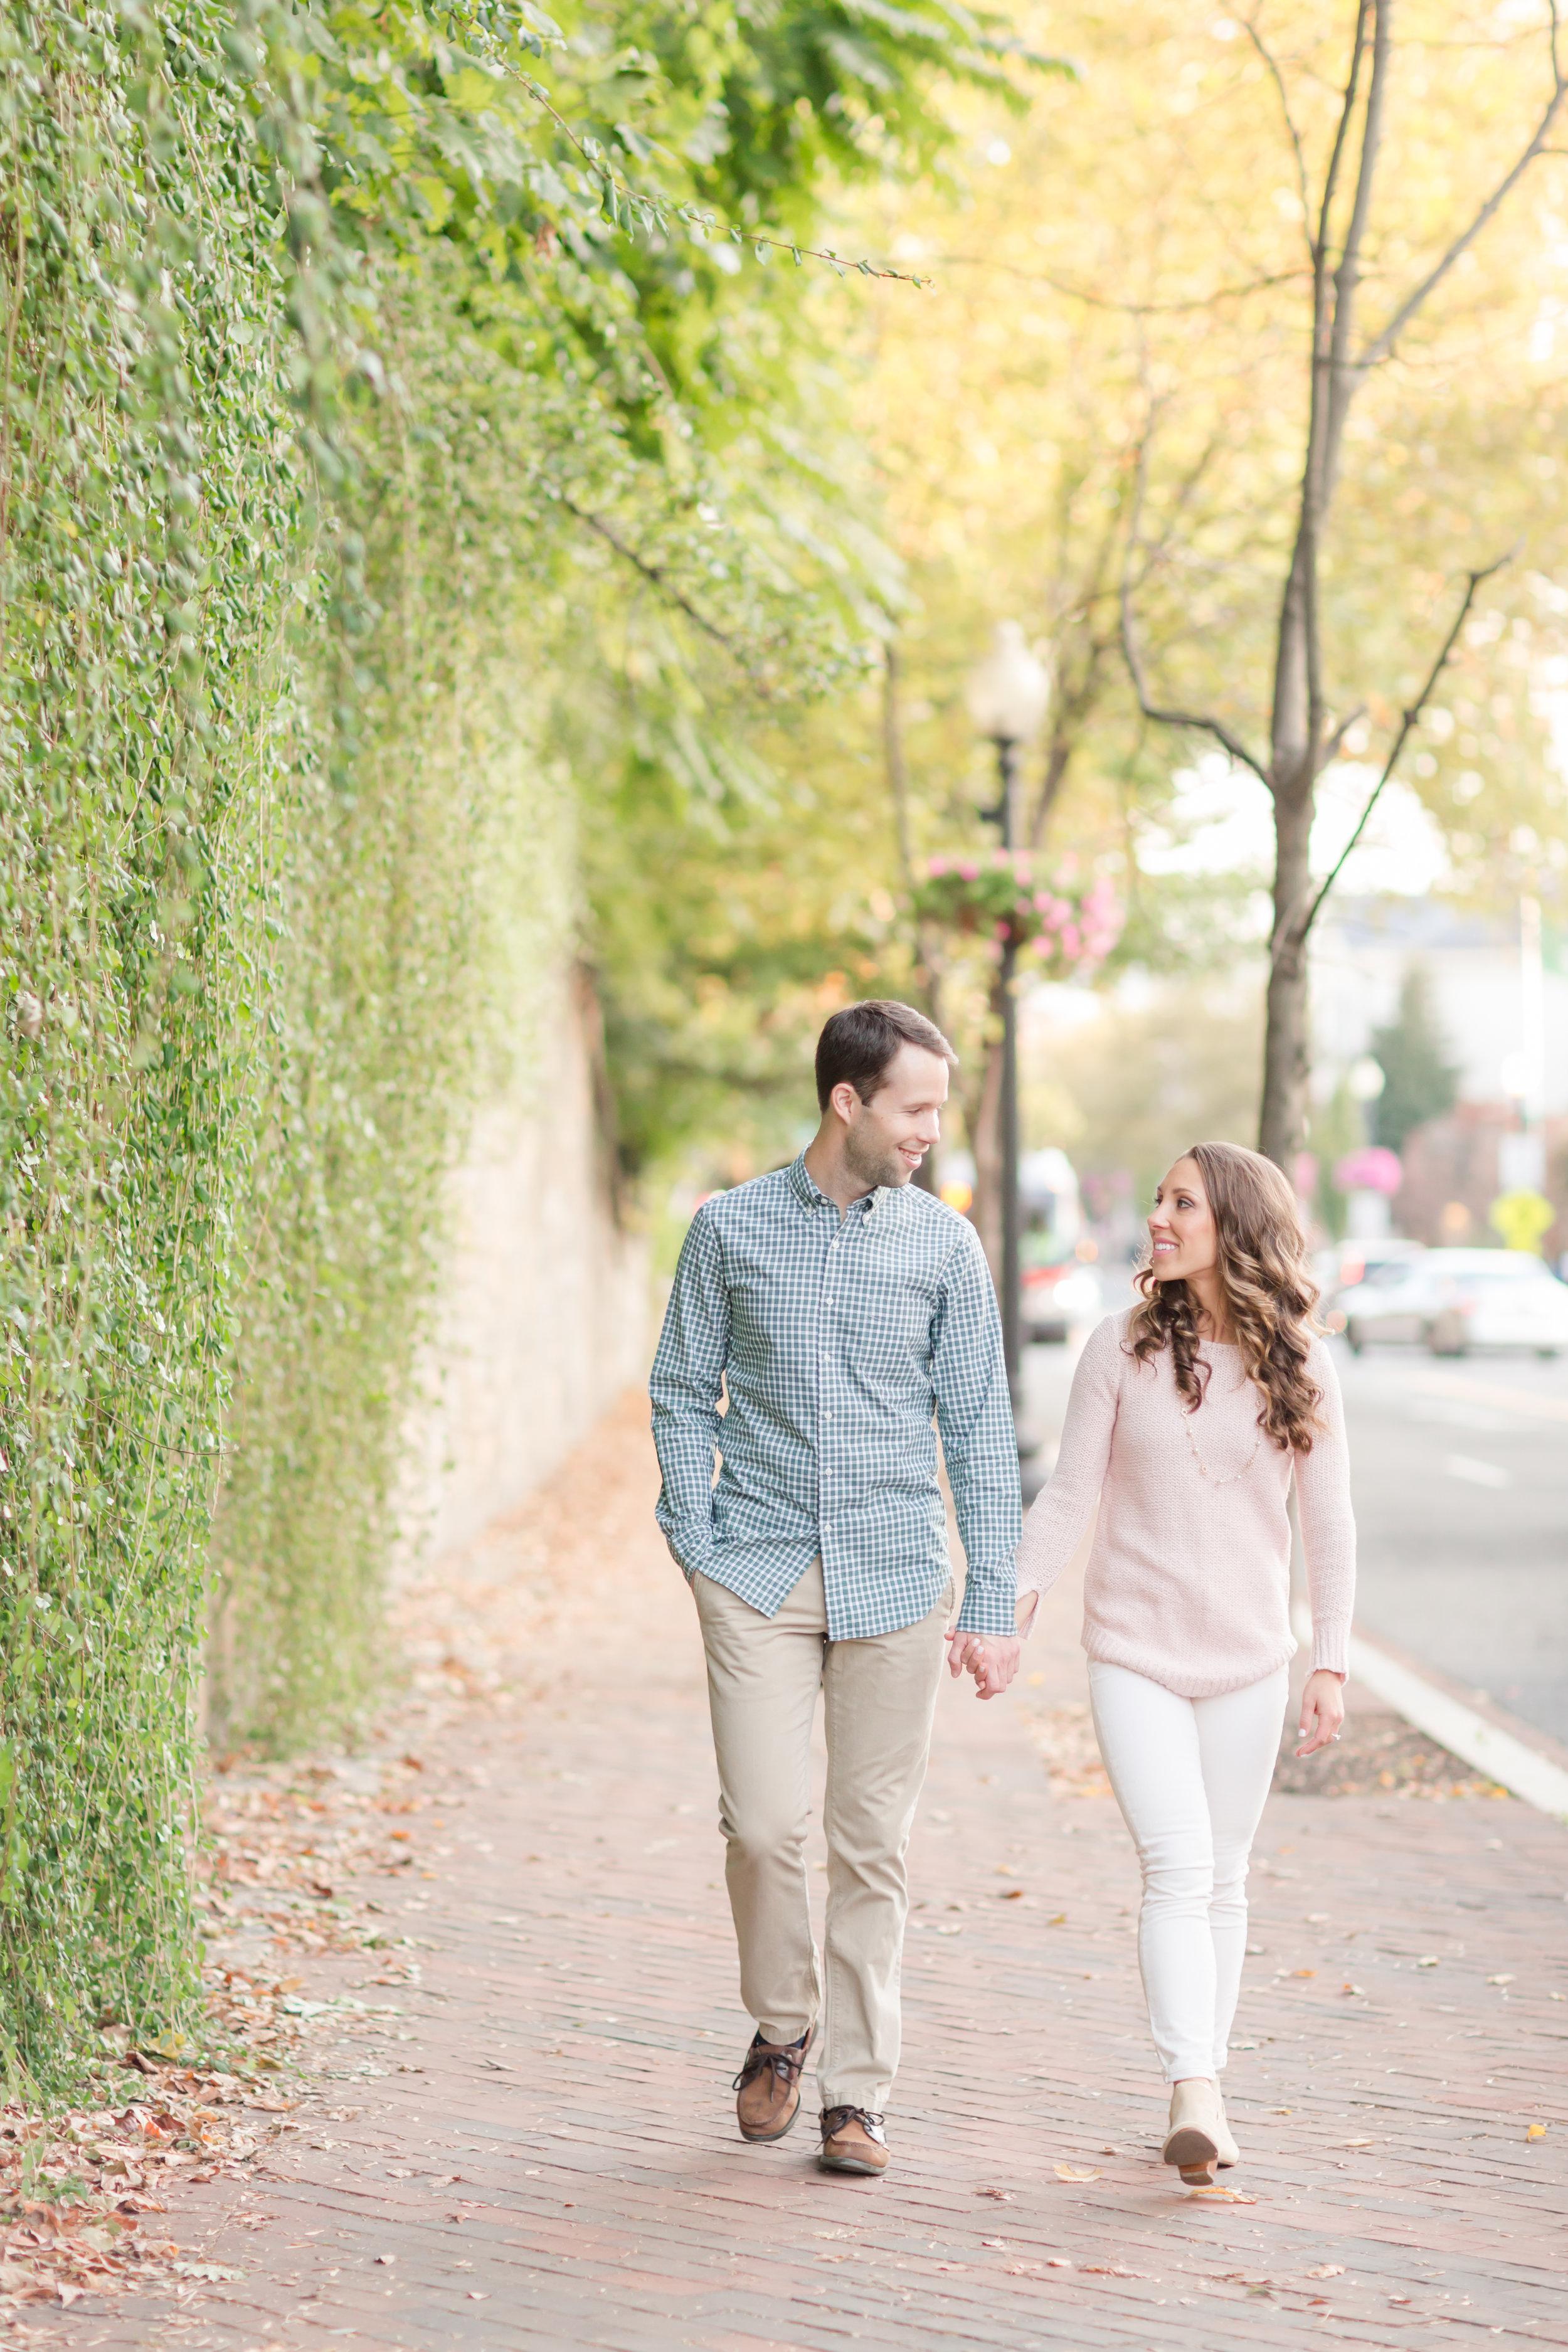 Emily Schroeder & Brian Malat Engagement-225.jpg